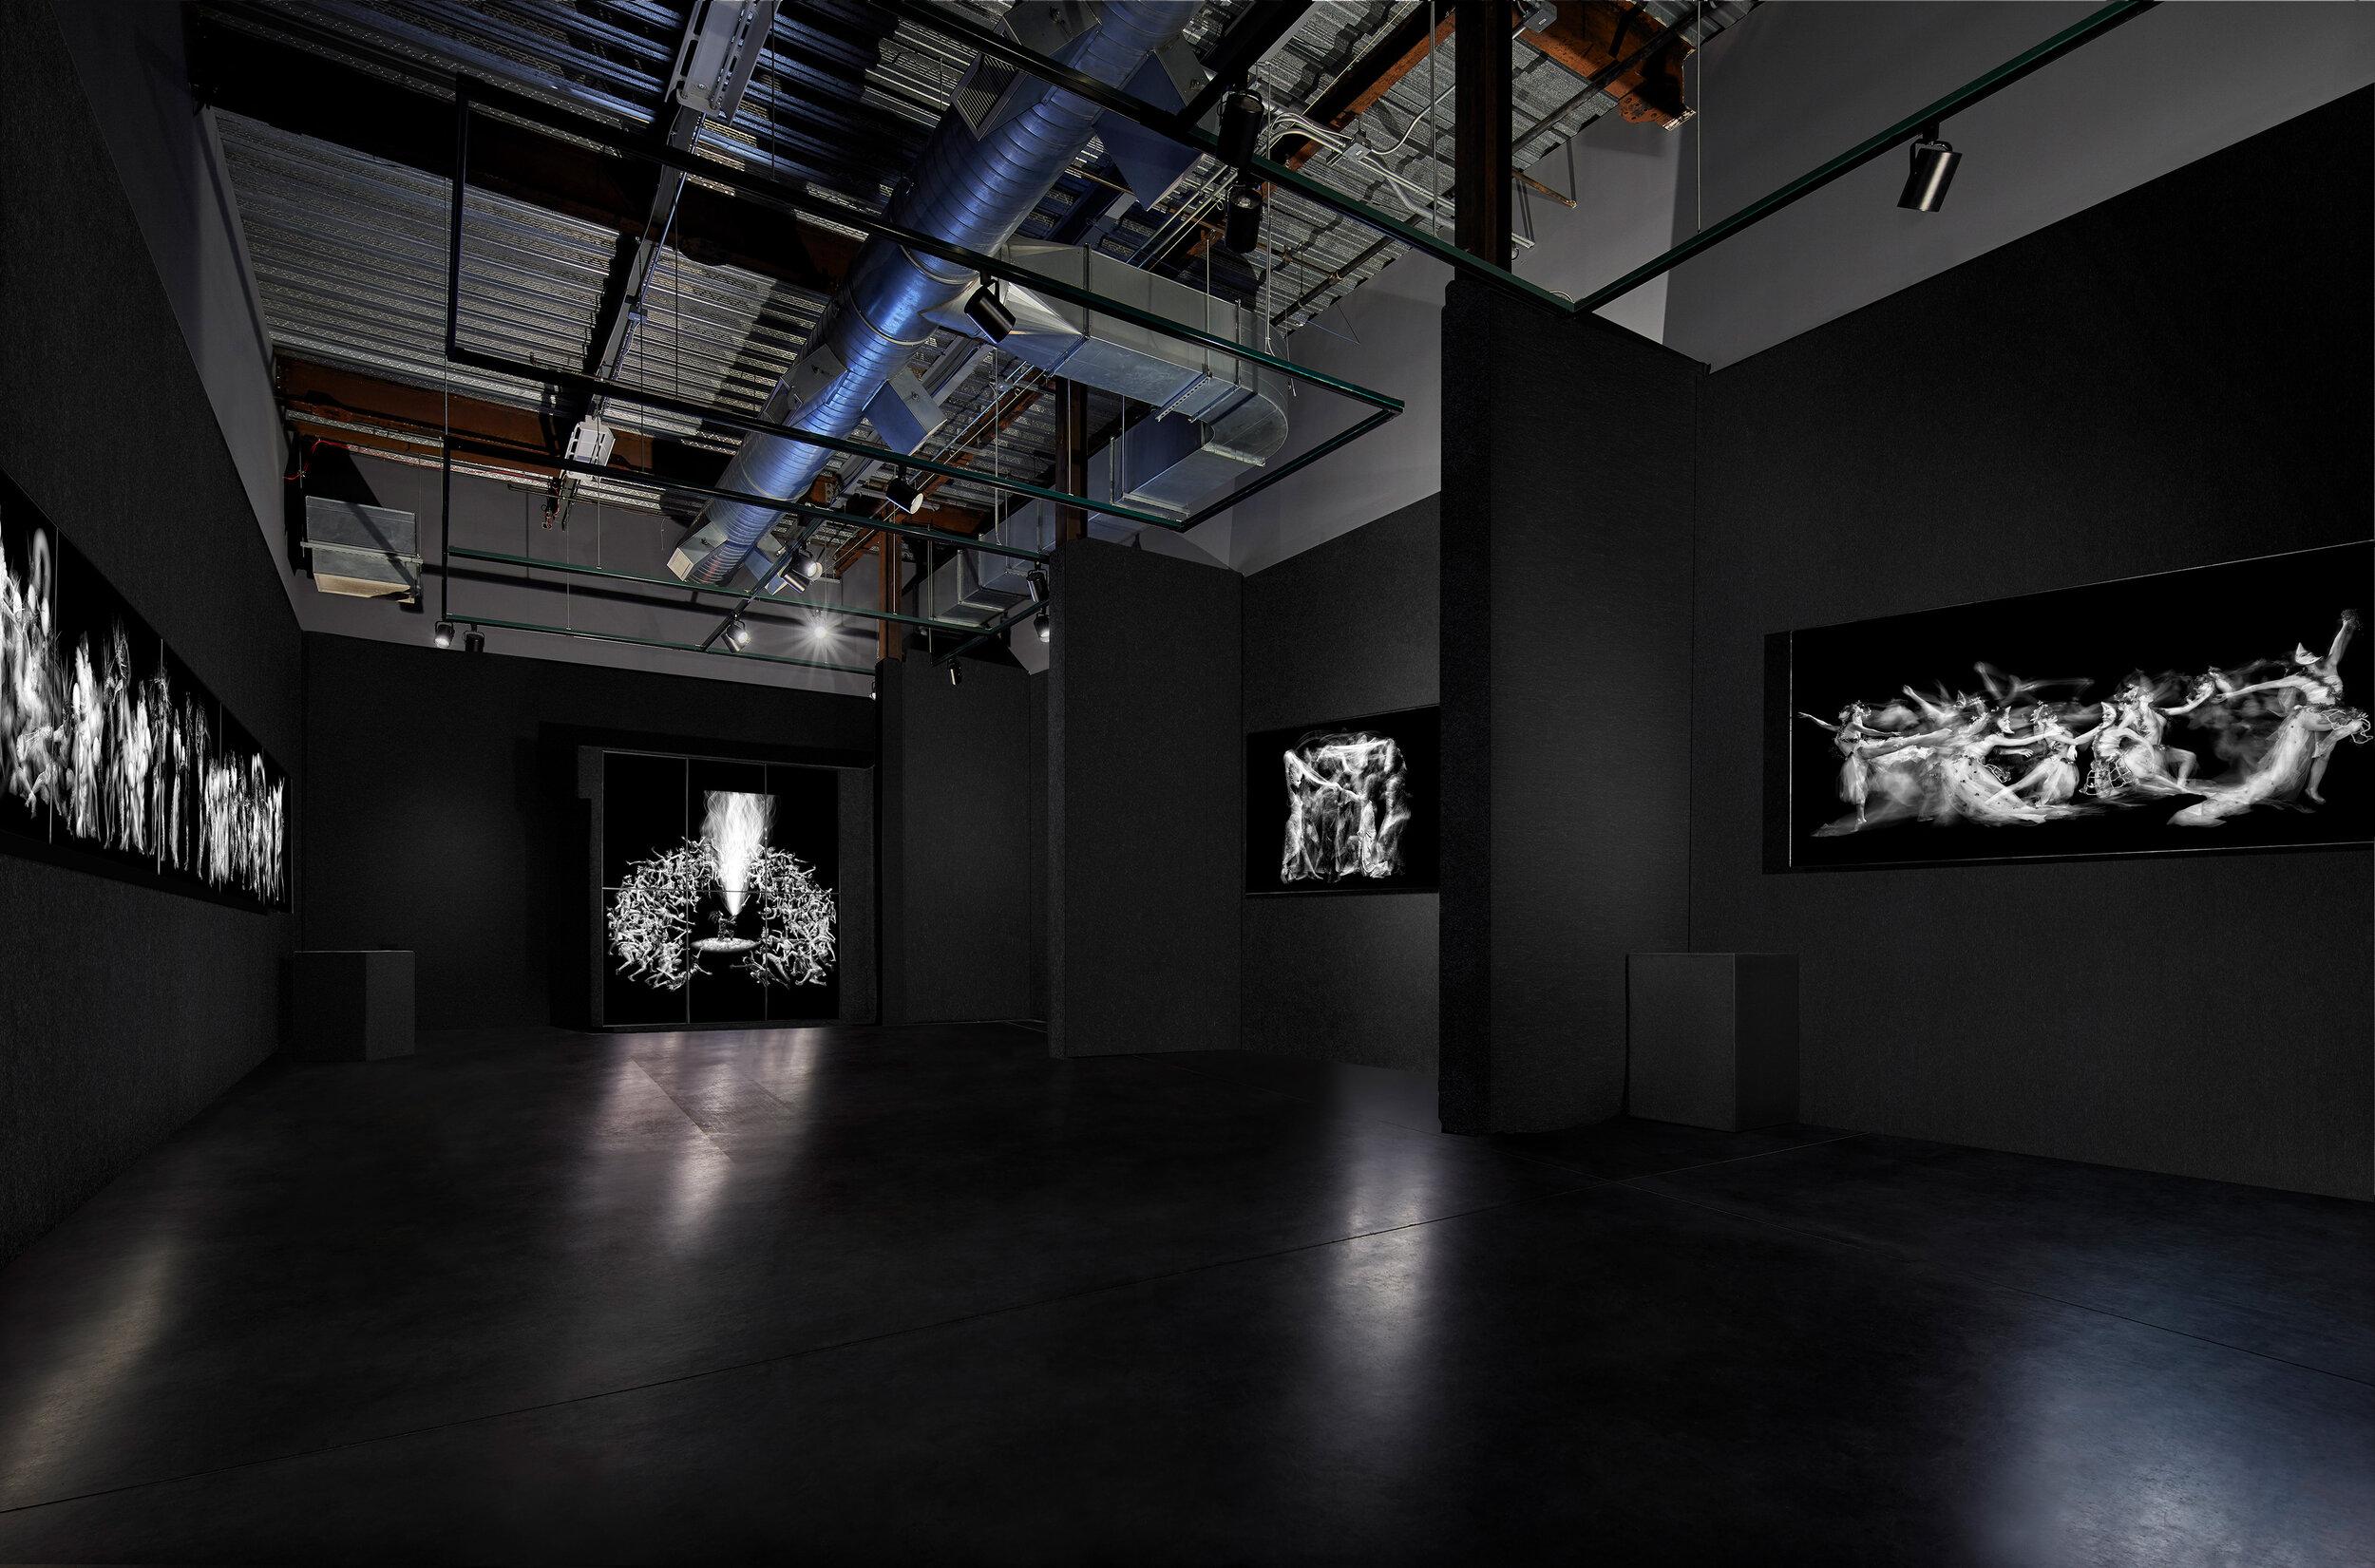 Installation View - The Delaware Contemporary,  John Singletary, OLED Multimedia/Sound Installation,  Photo Credit: Rick Wright